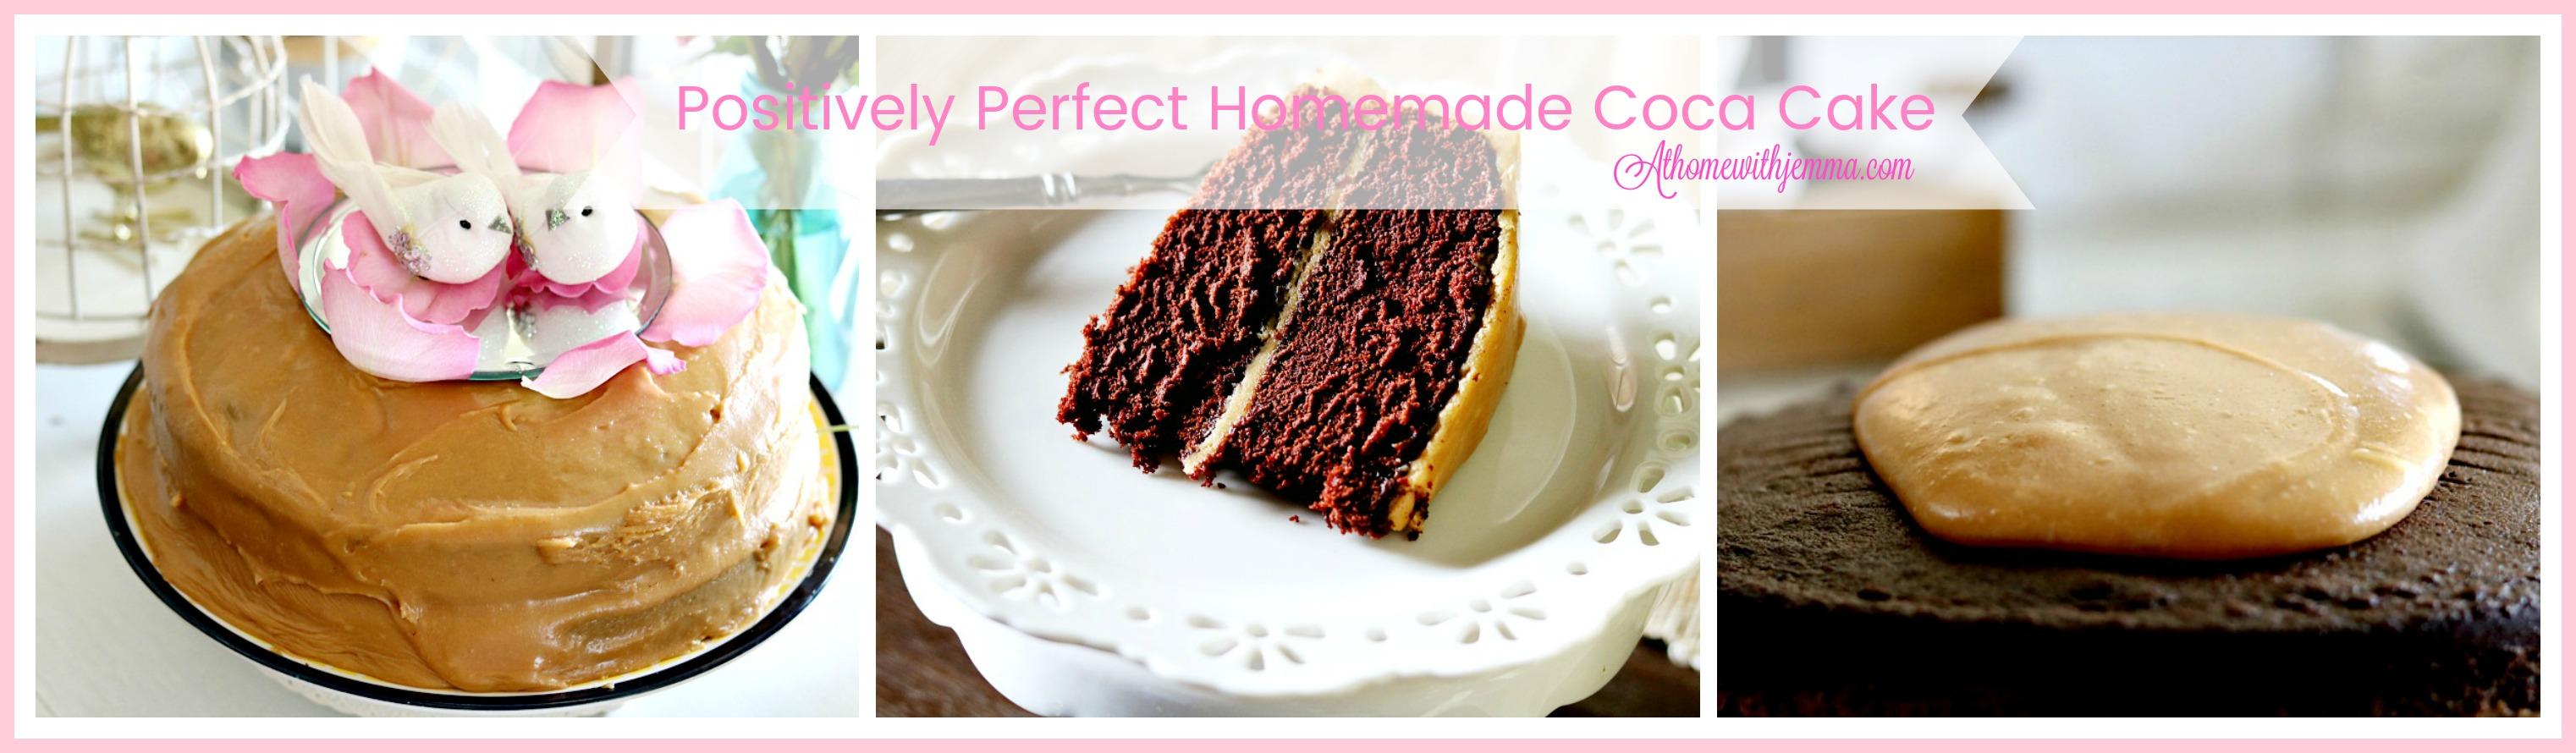 cake-chocolate-fudge-cocoa-homemade-delicious-Holiday-Birthday-Shower-